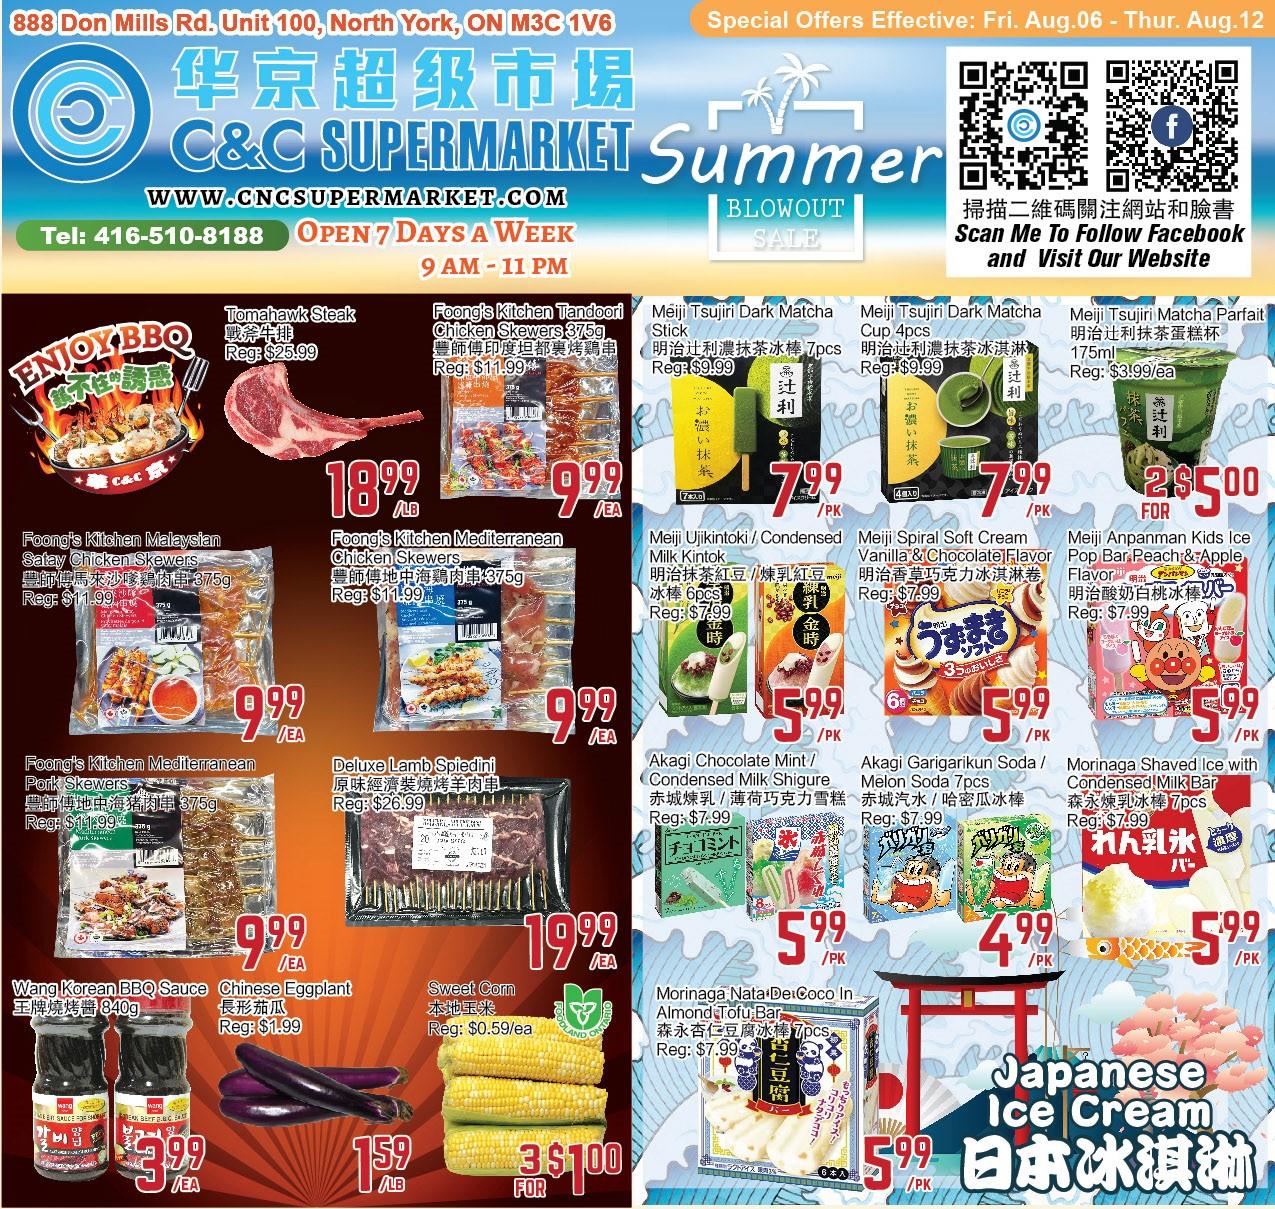 C&C Supermarket Flyer | Aug 6